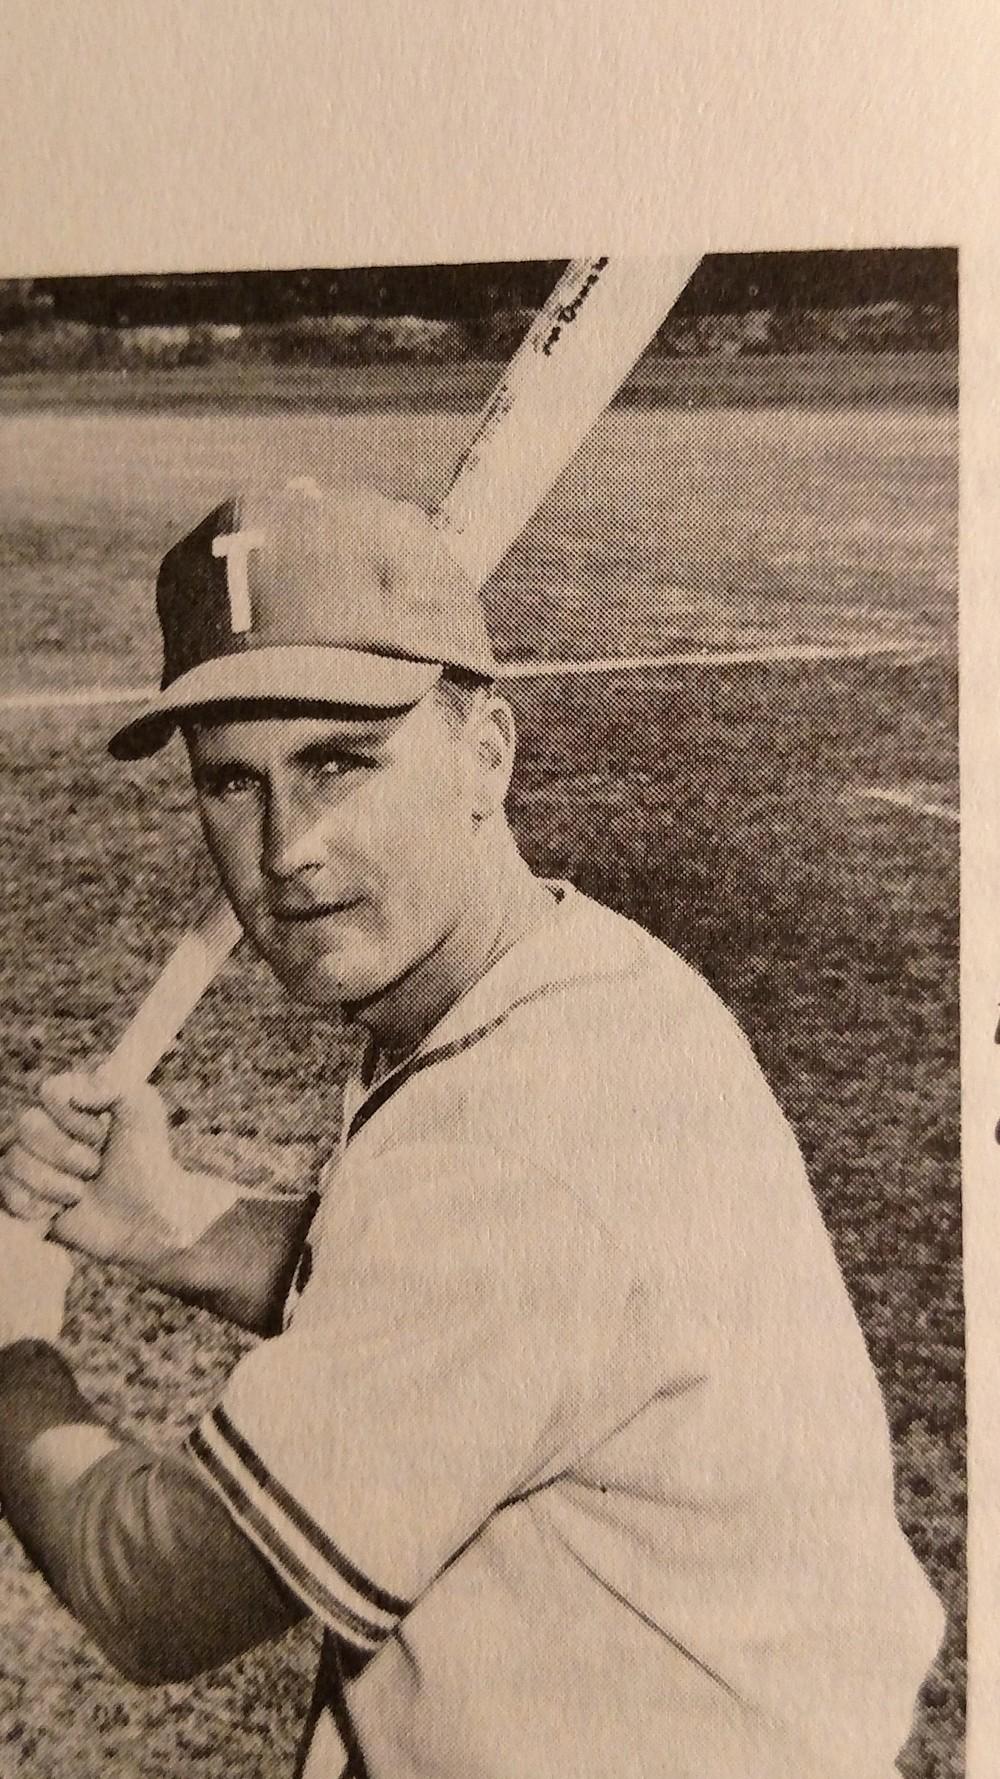 Wayne McDonald 1960